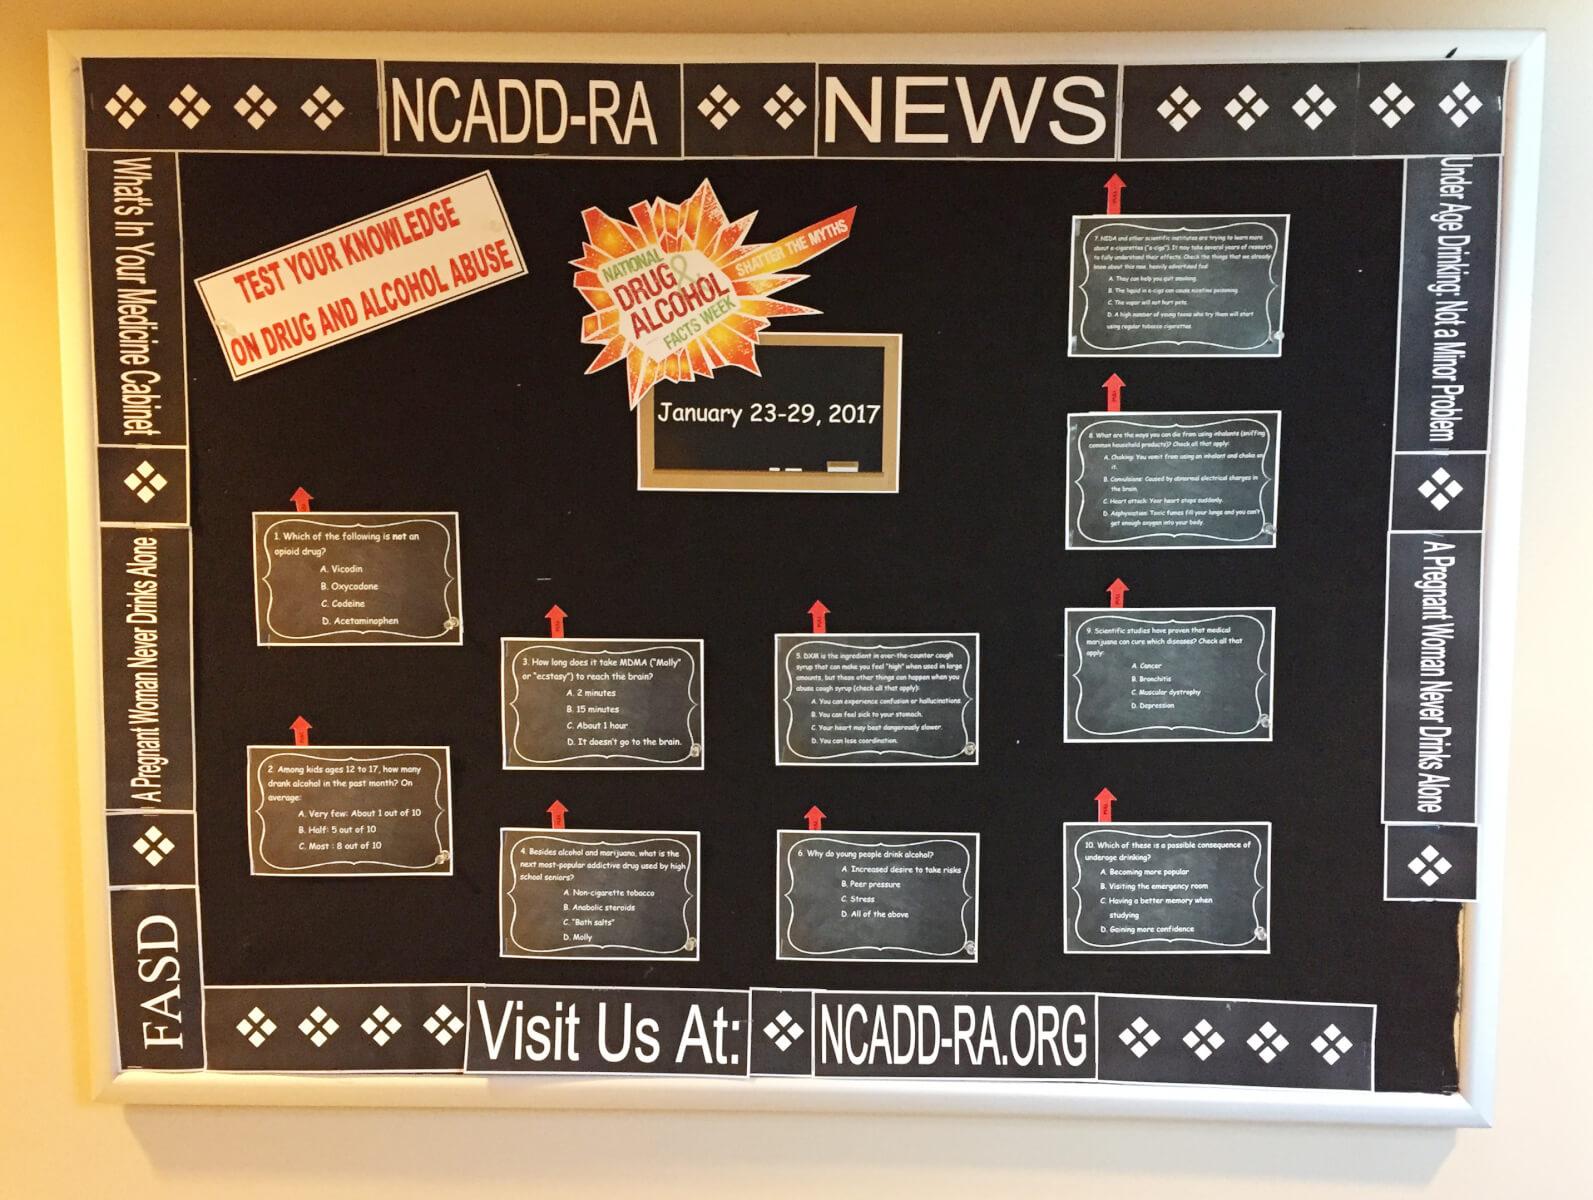 NCADD-RA NEWS Bulletin Board